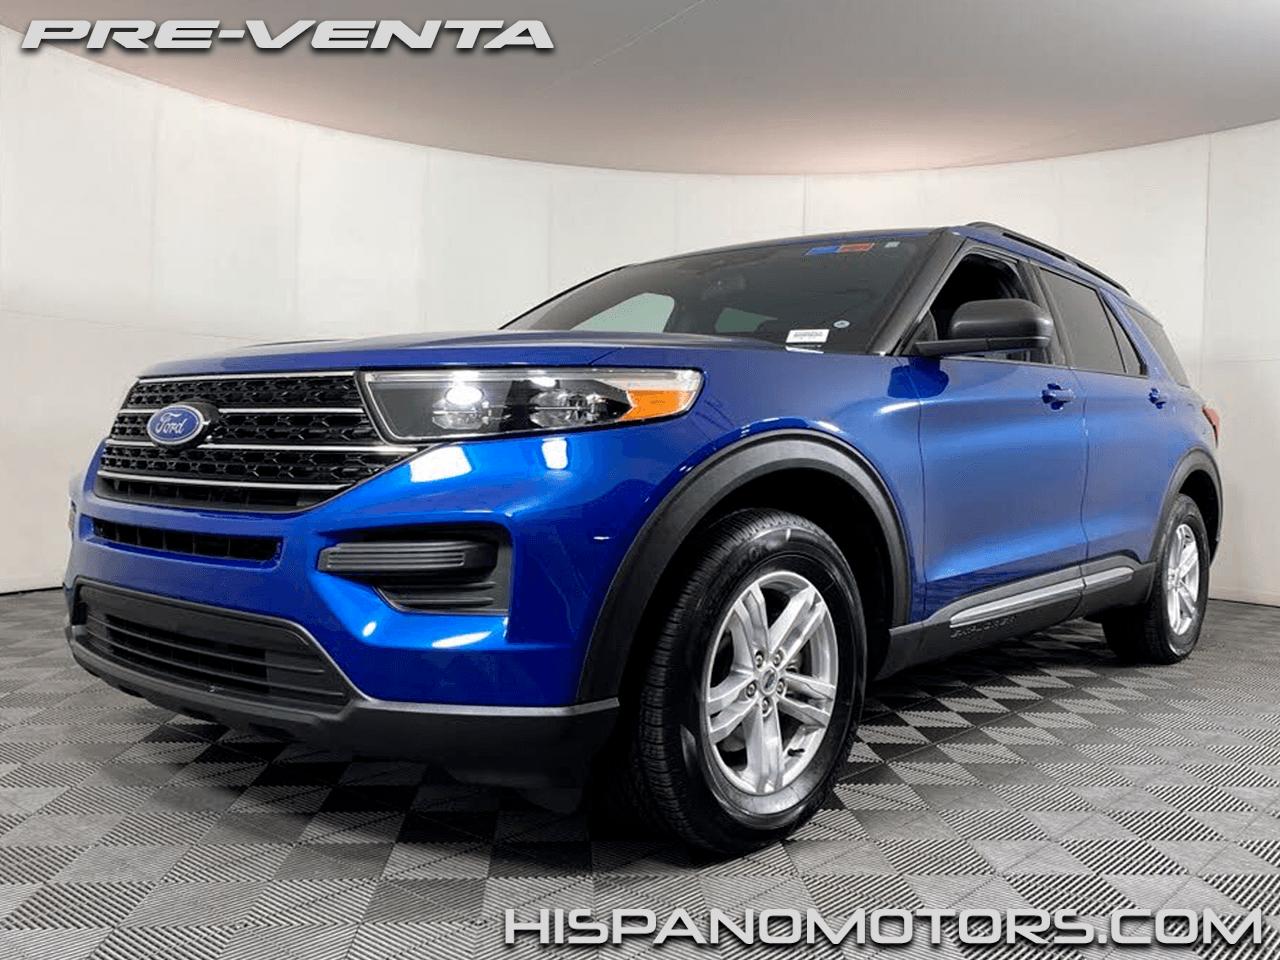 2020 FORD EXPLORER 4WD 2.3T - Arequipa - Perú - auto importado por Hispanomotors